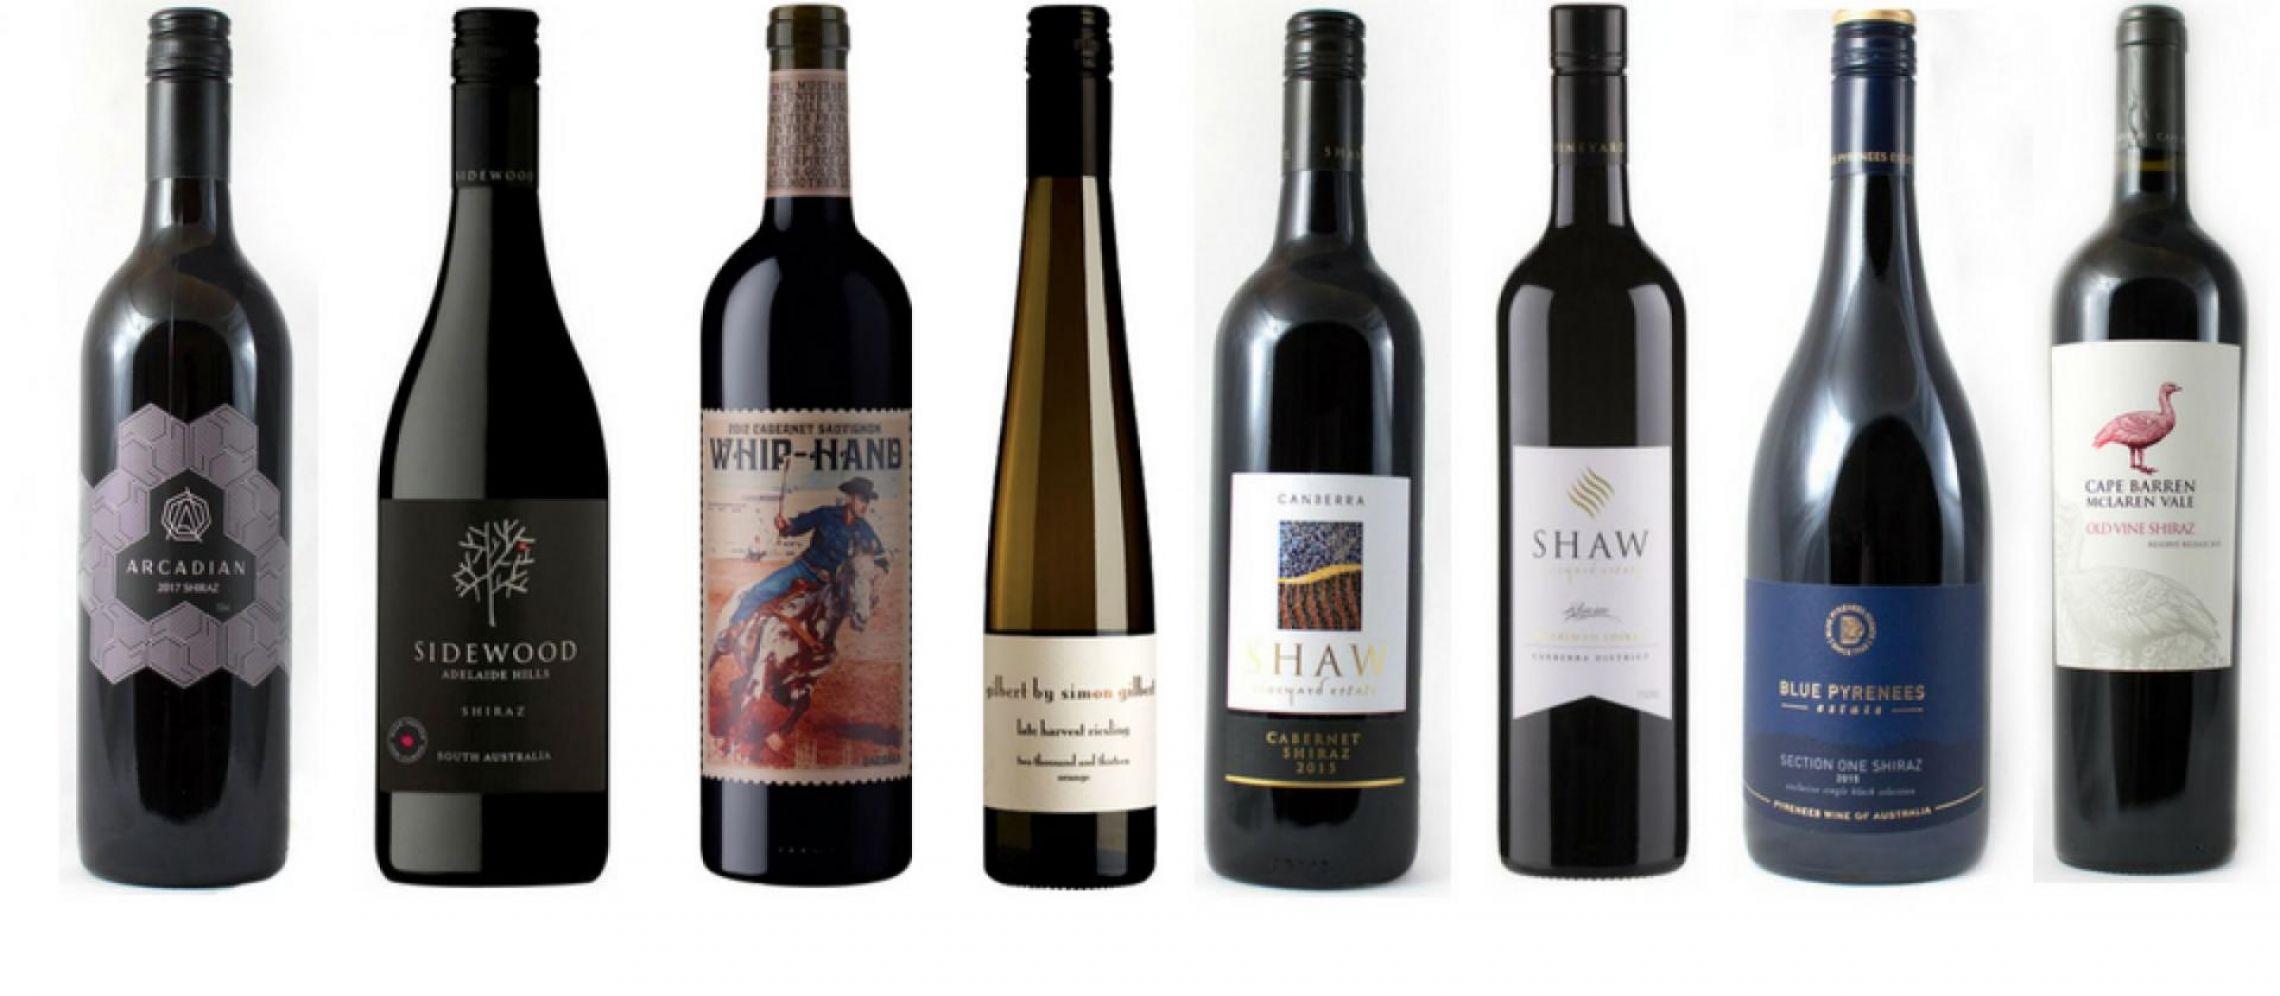 Photo for: 2018's Top 10 Australian Wines